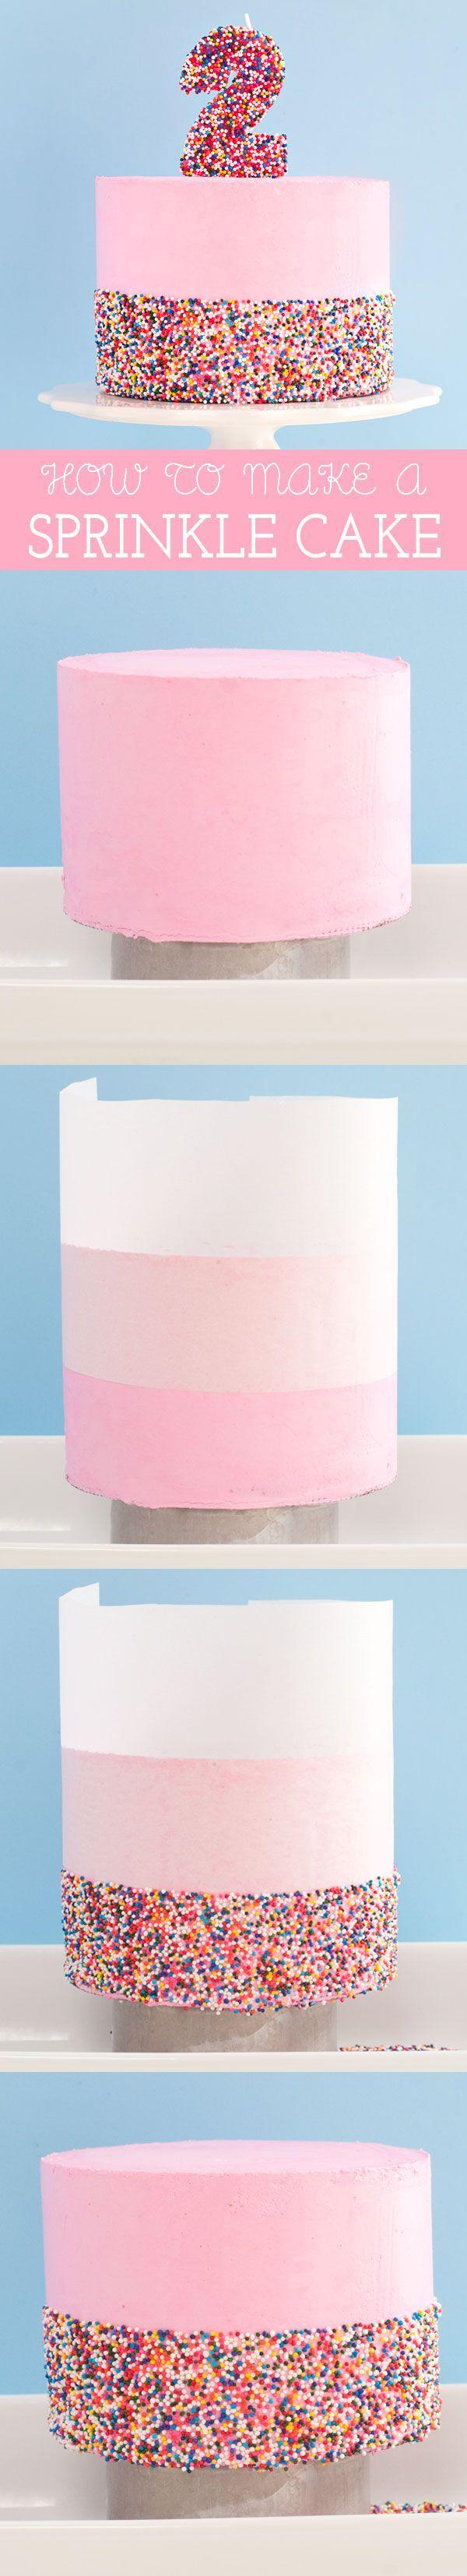 How To Make A Sprinkle Cake   Sprinkles for Breakfast